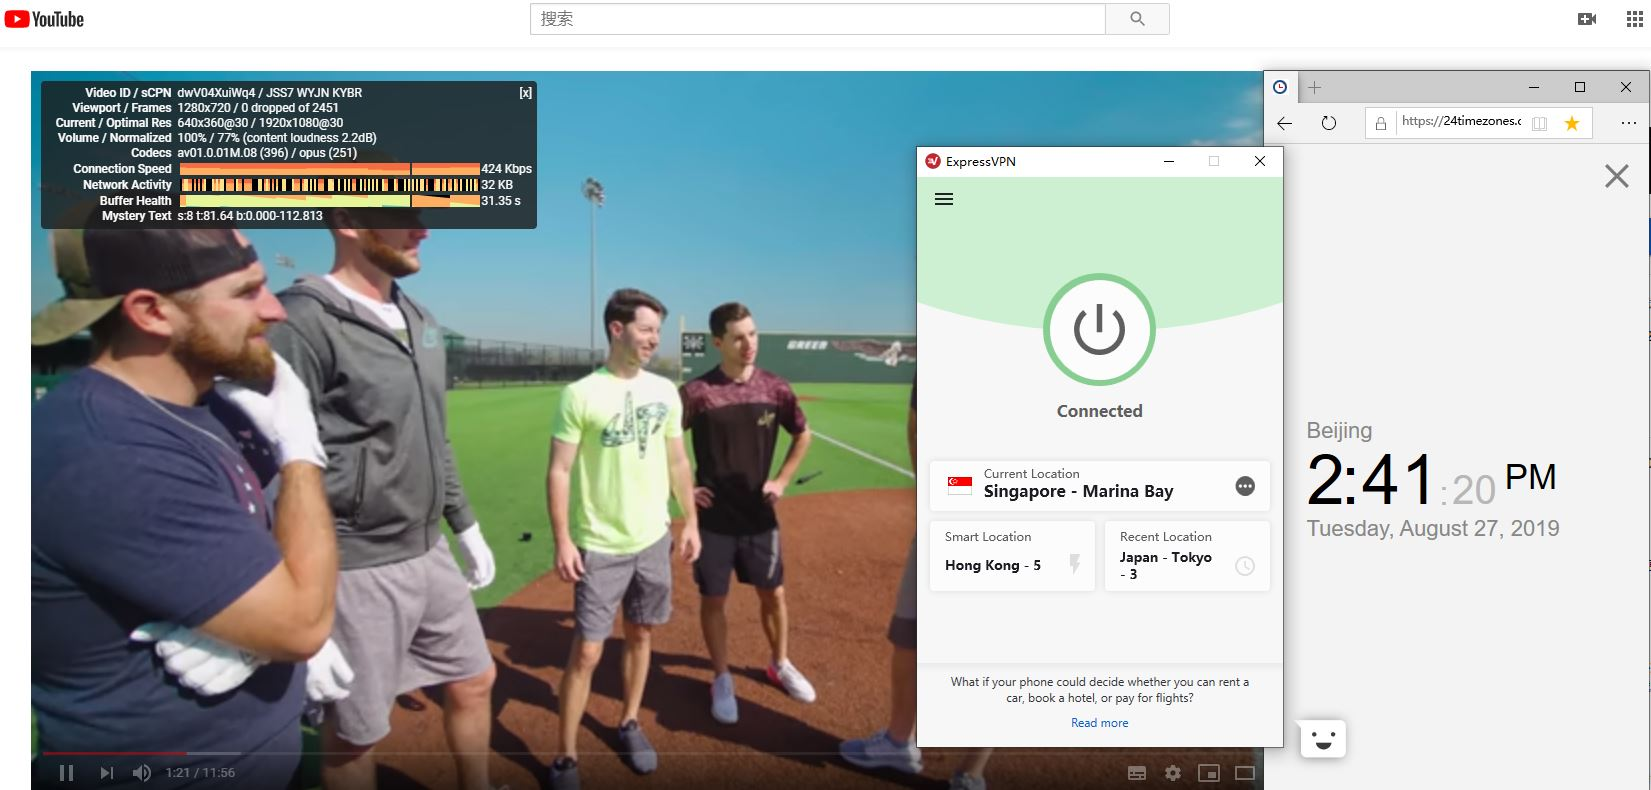 windows expressvpn singapore-marna bay服务器 中国VPN翻墙 科学上网 YouTube速度测试-20190827